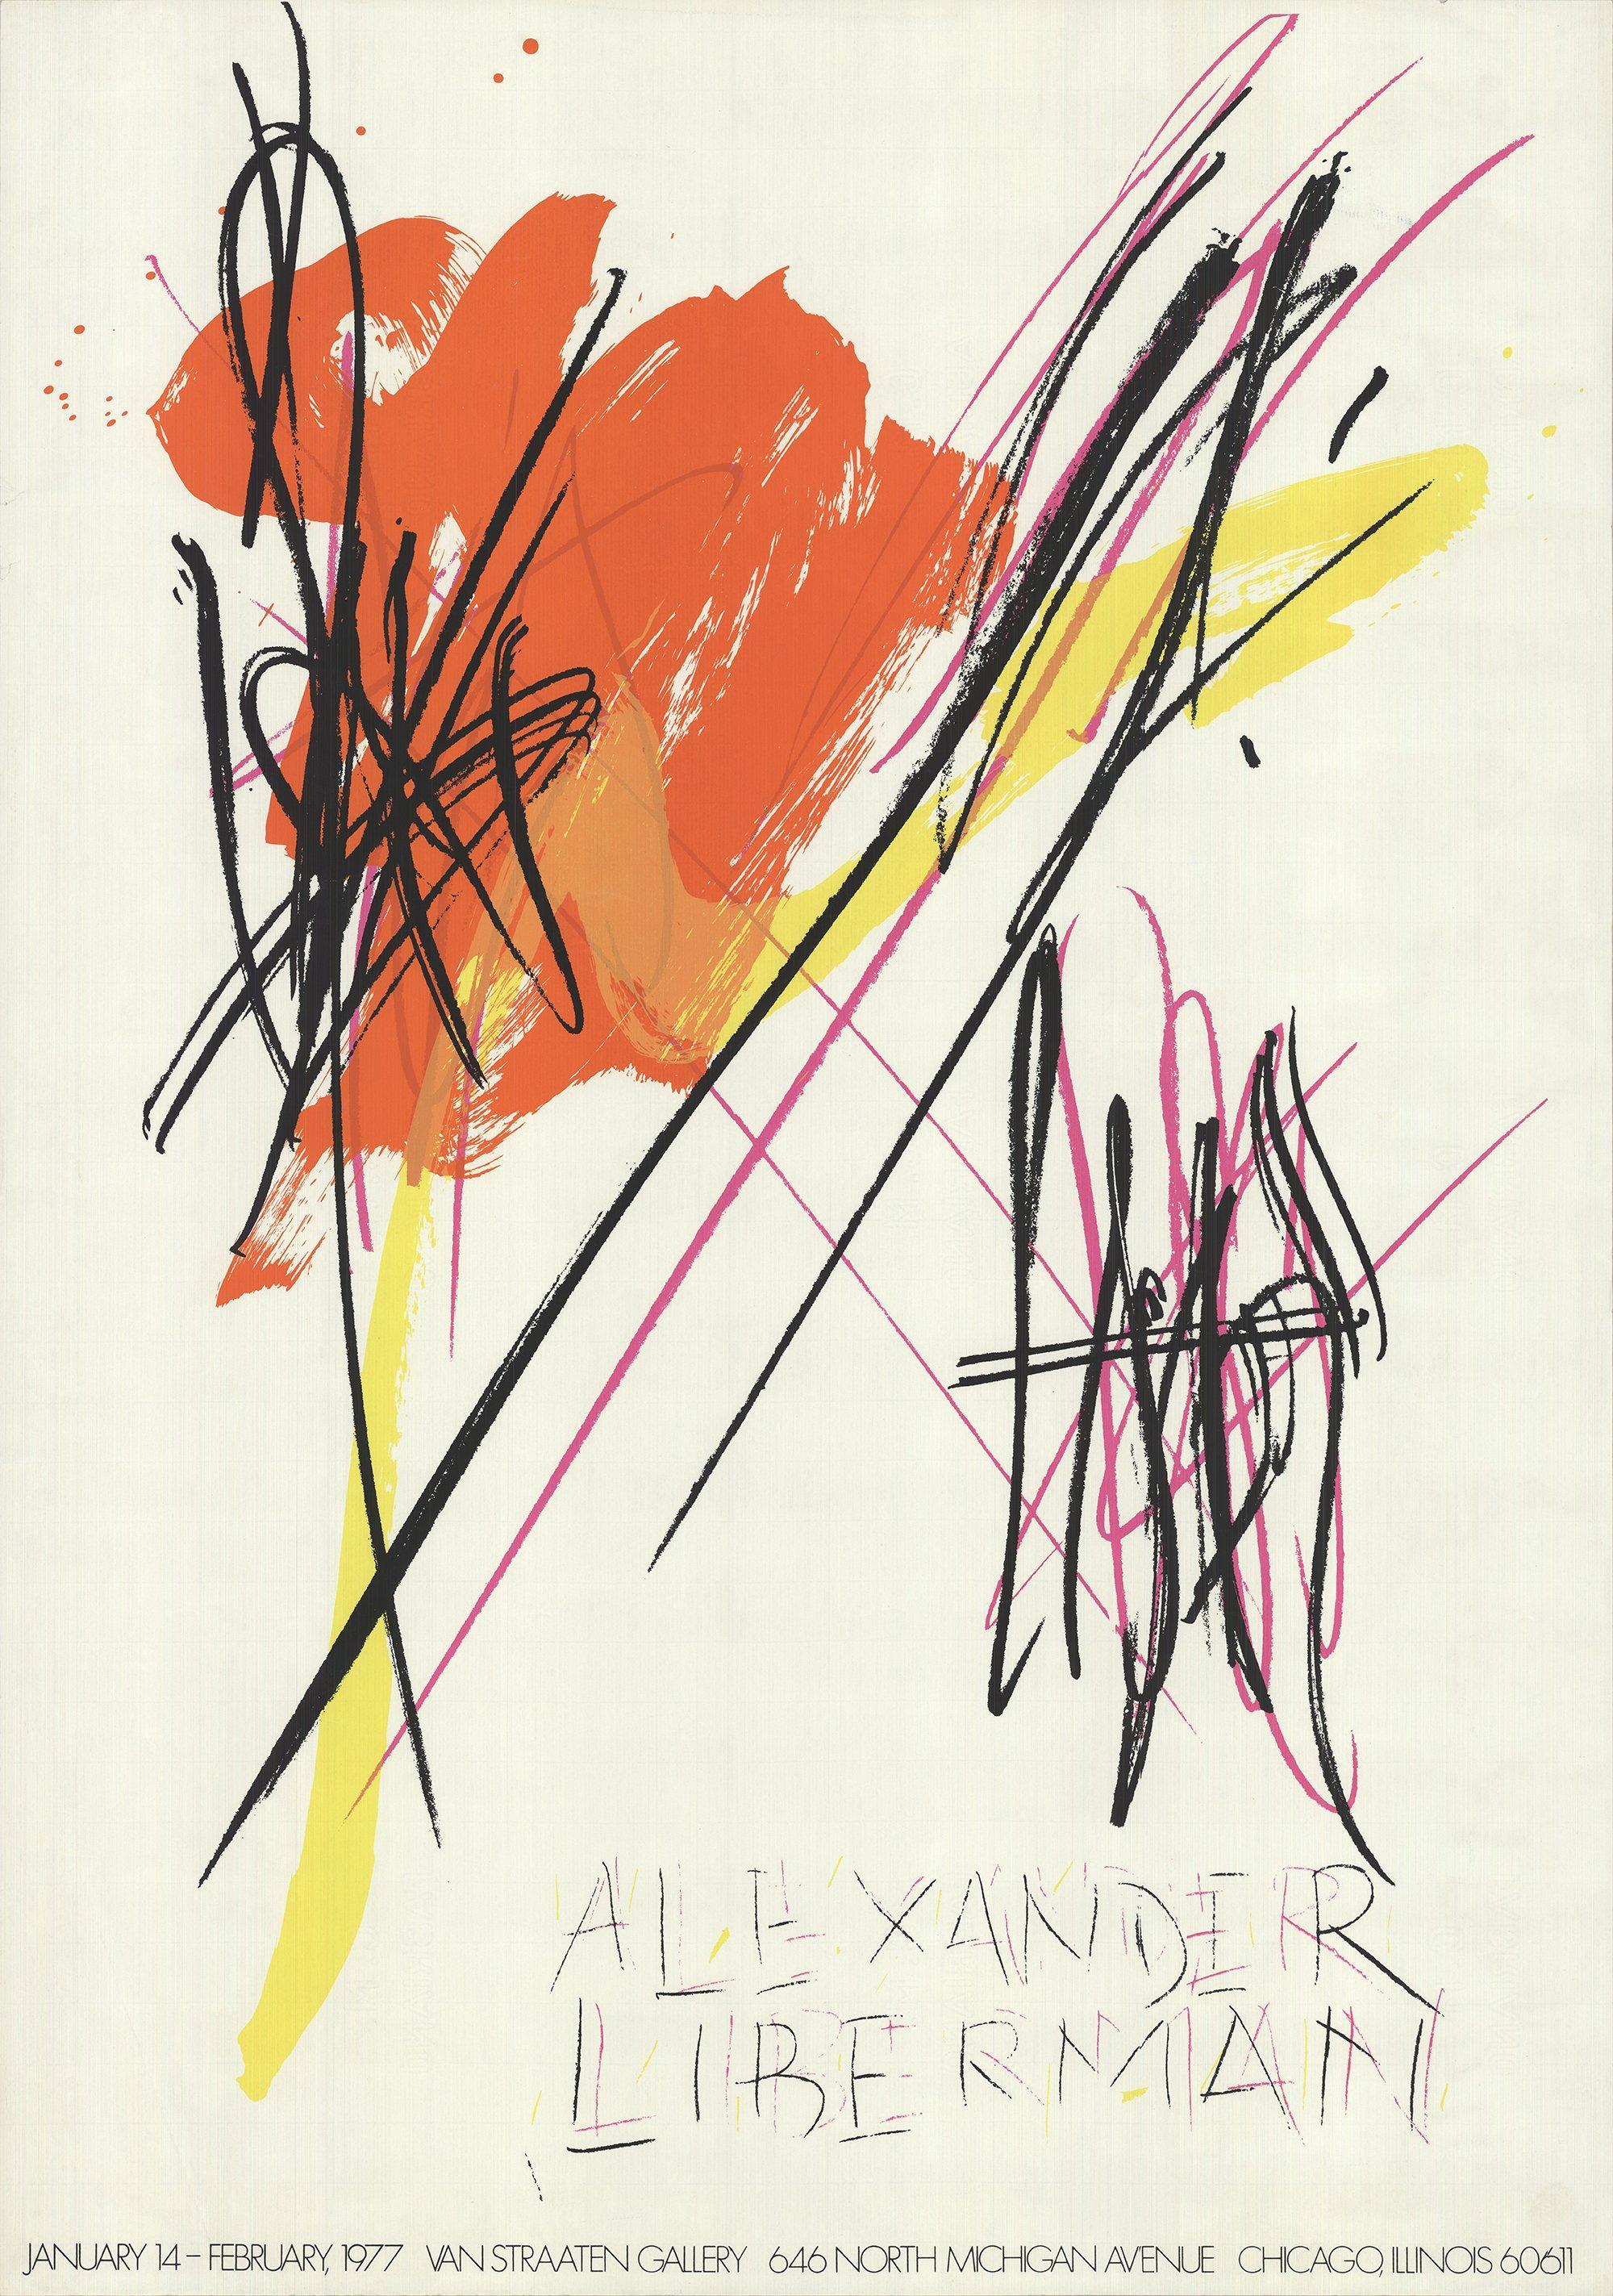 1977 After Alexander Liberman 'Untitled' Contemporary Offset Lithograph